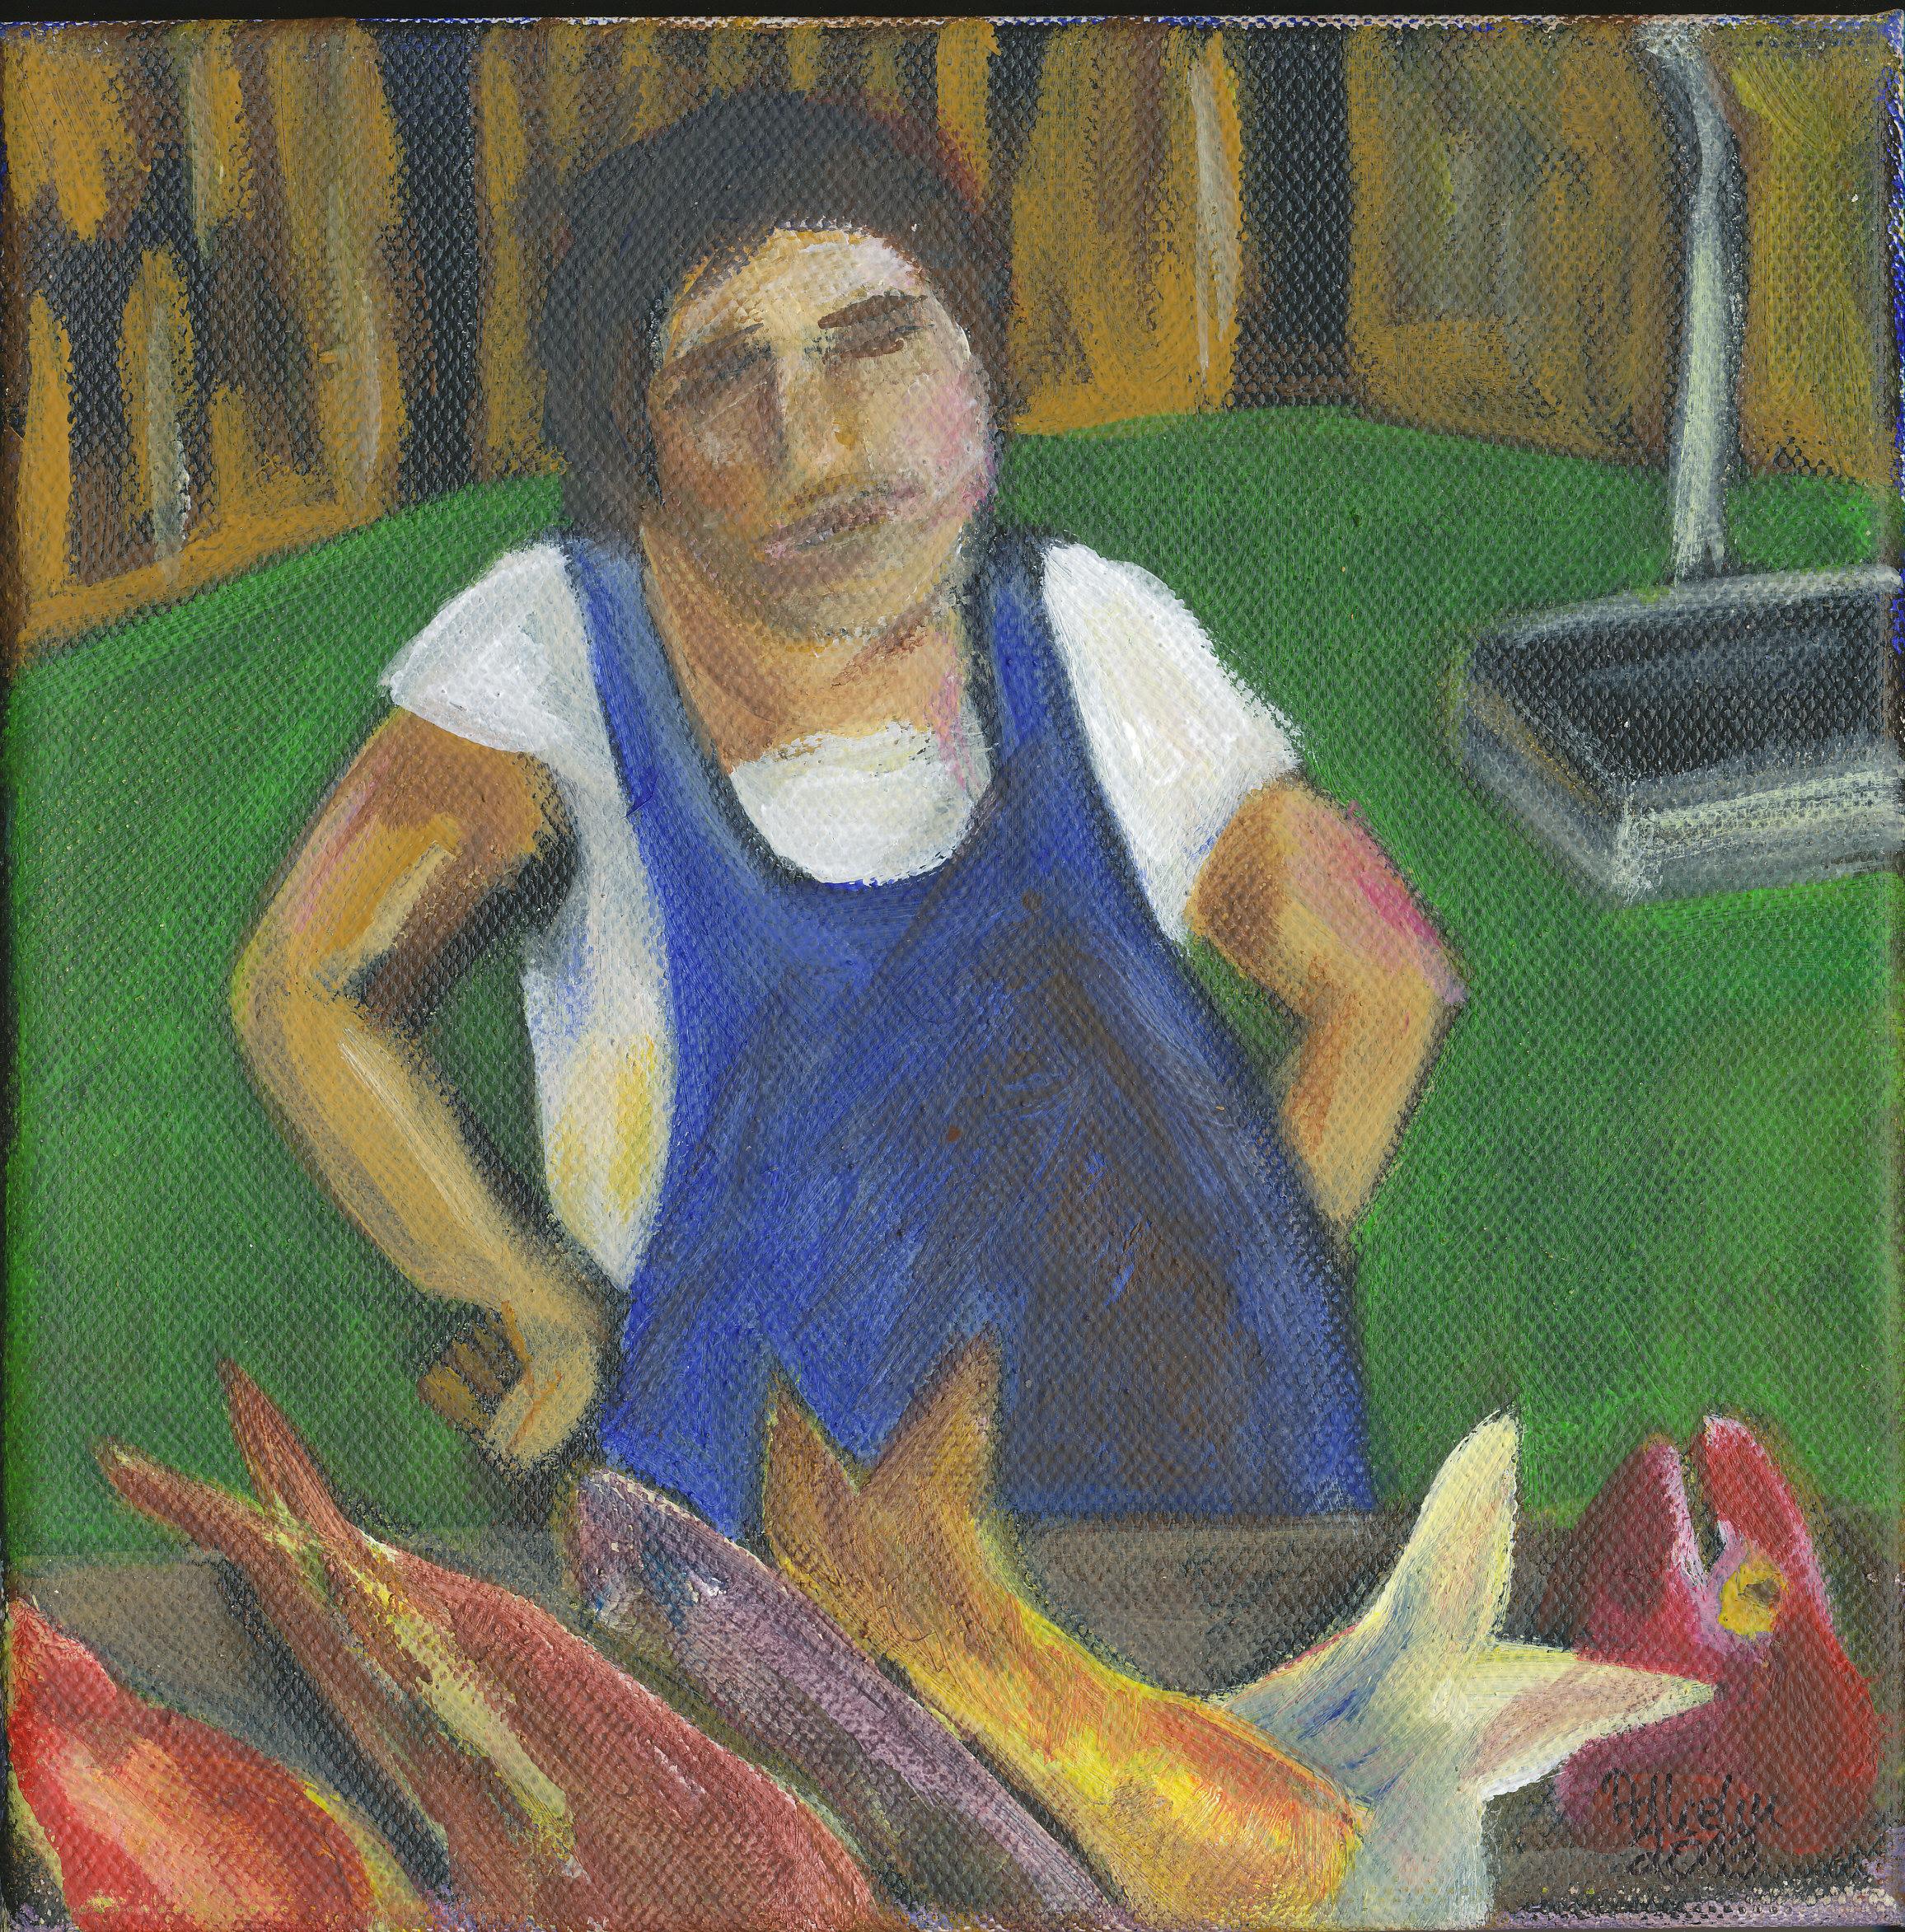 Fischverkäuferin in Portimao